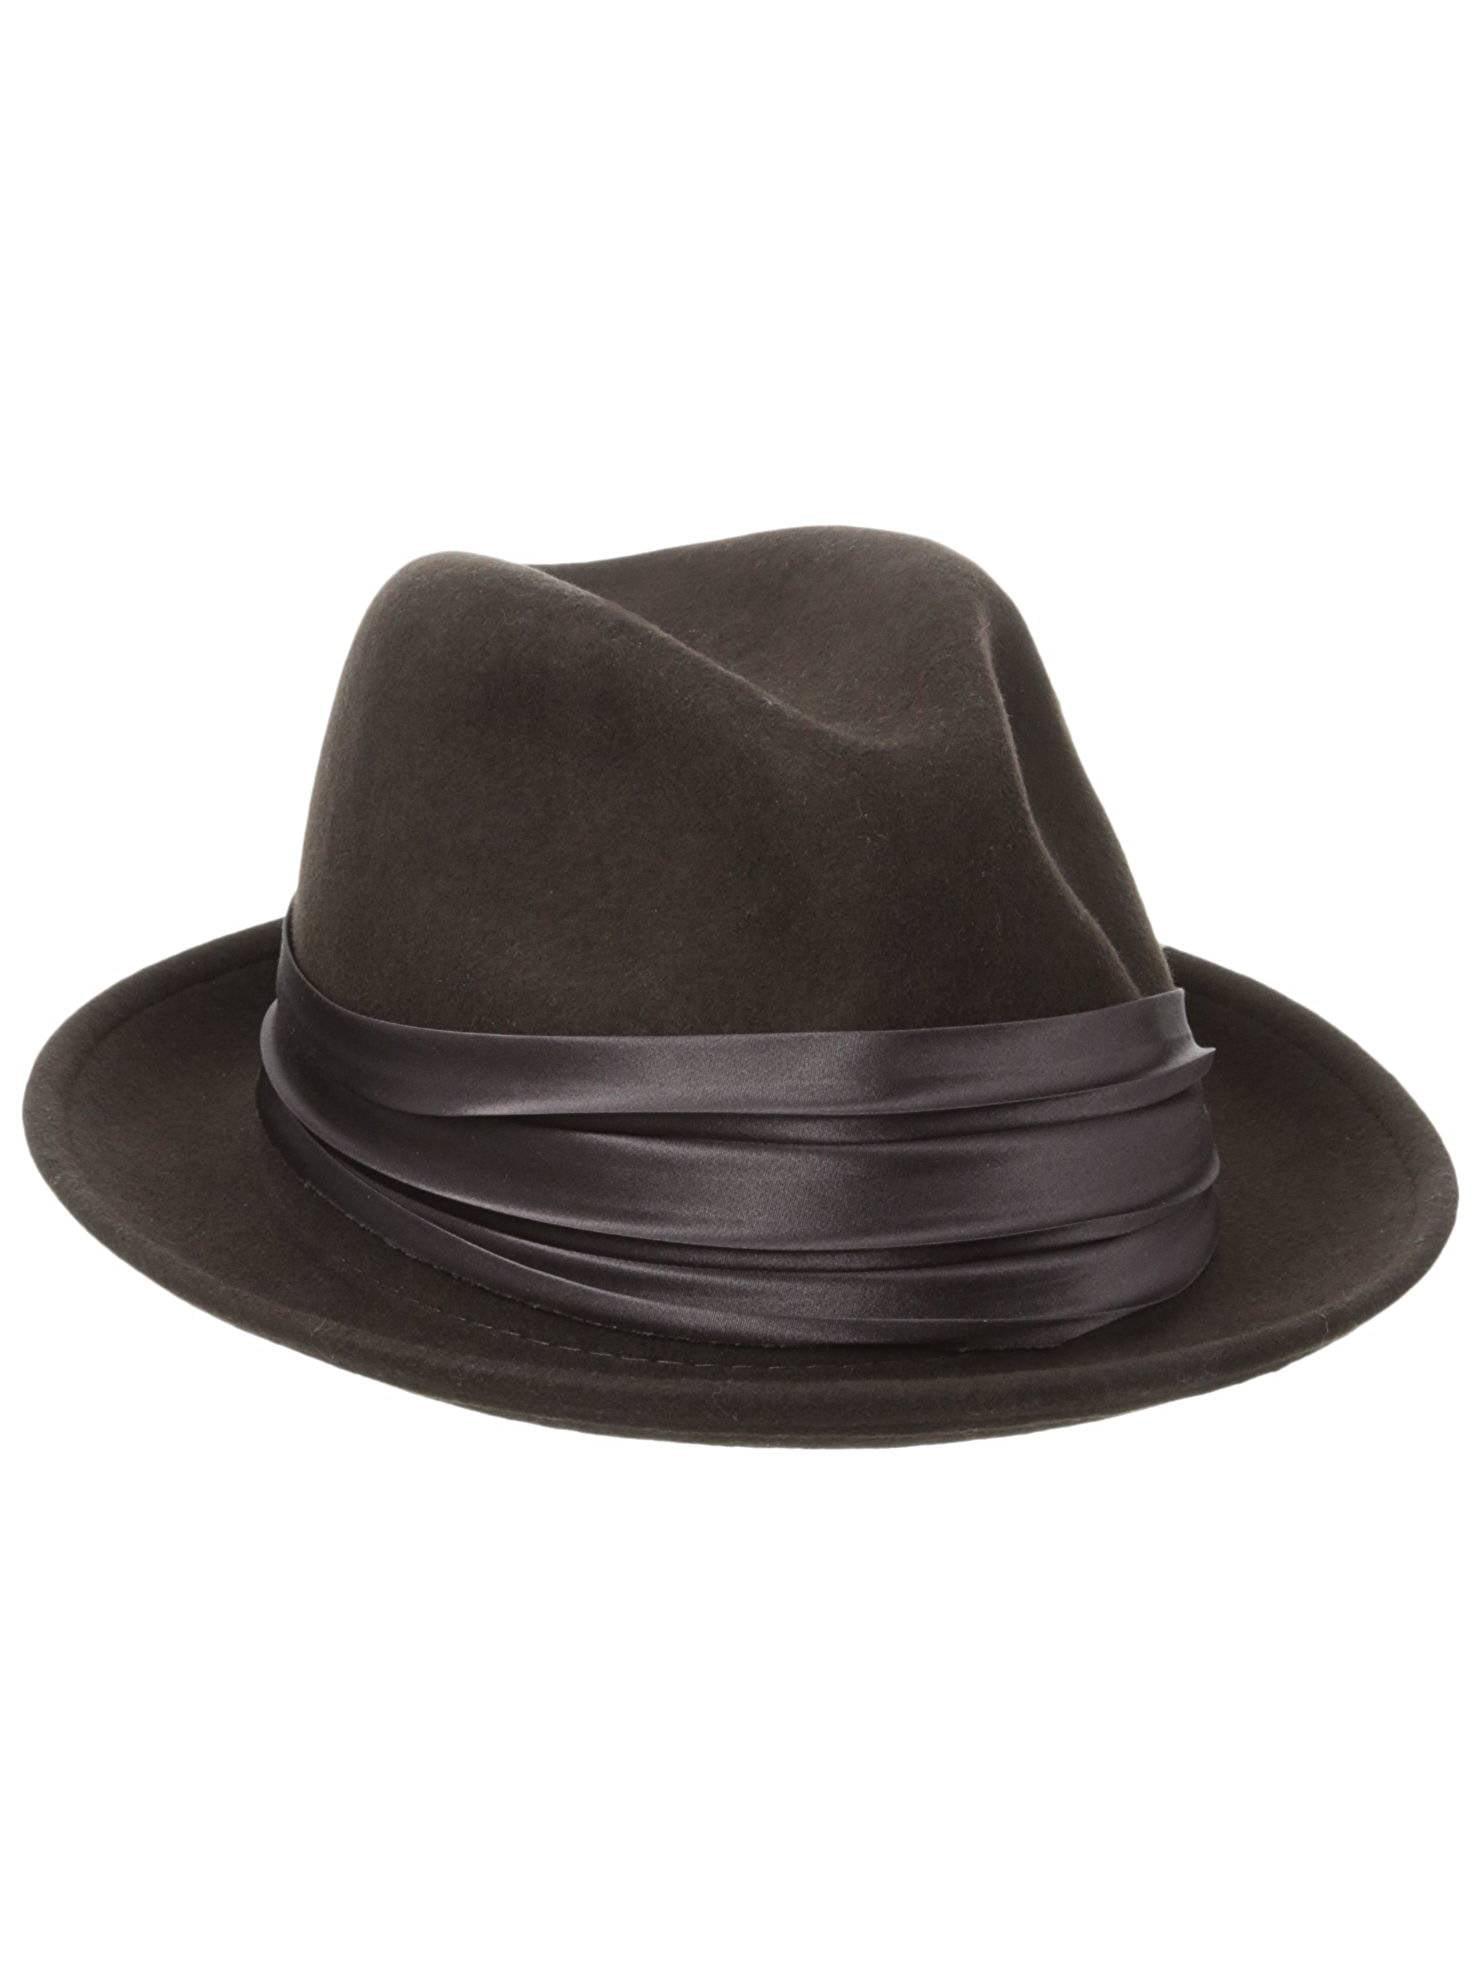 1ea2ff40aa8 Stacy Adams Men s Crushable Wool Felt Snap Brim Fedora Hat ...